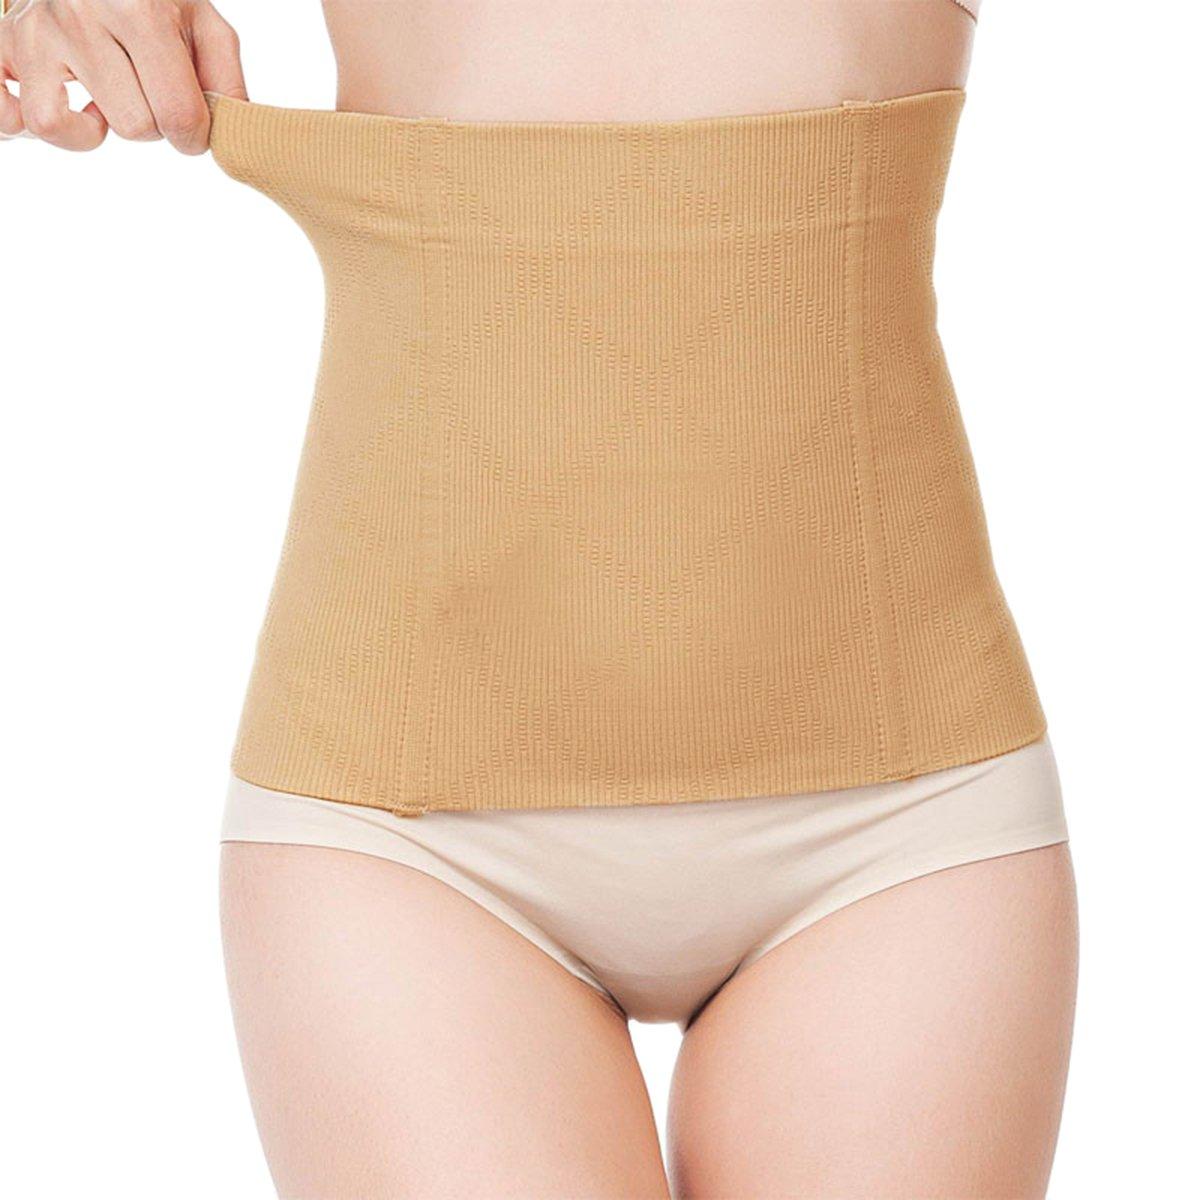 57db40d3fd0 Shymay Women s No Closure Waist Corset Cincher Boned Tummy Control Waist  Girdle at Amazon Women s Clothing store